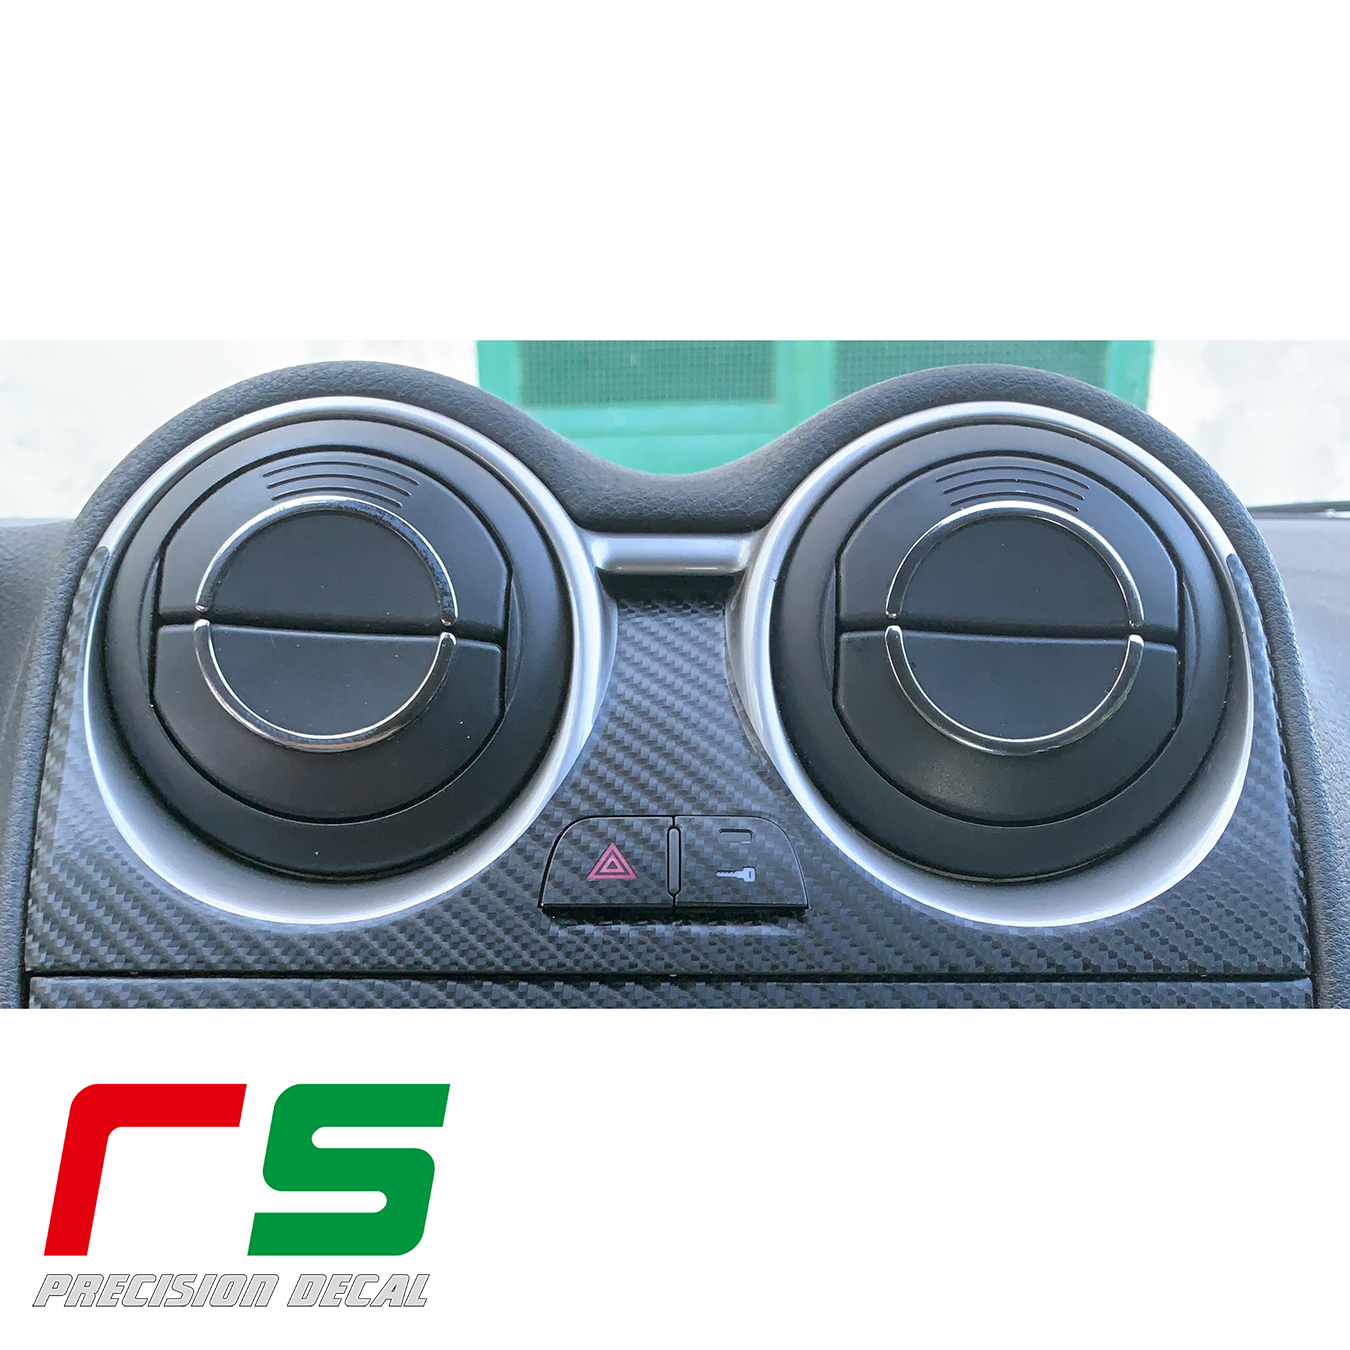 Alfa Romeo Mito Aufkleber decken Aufkleber Konsole Tuning Vents Carbonlook